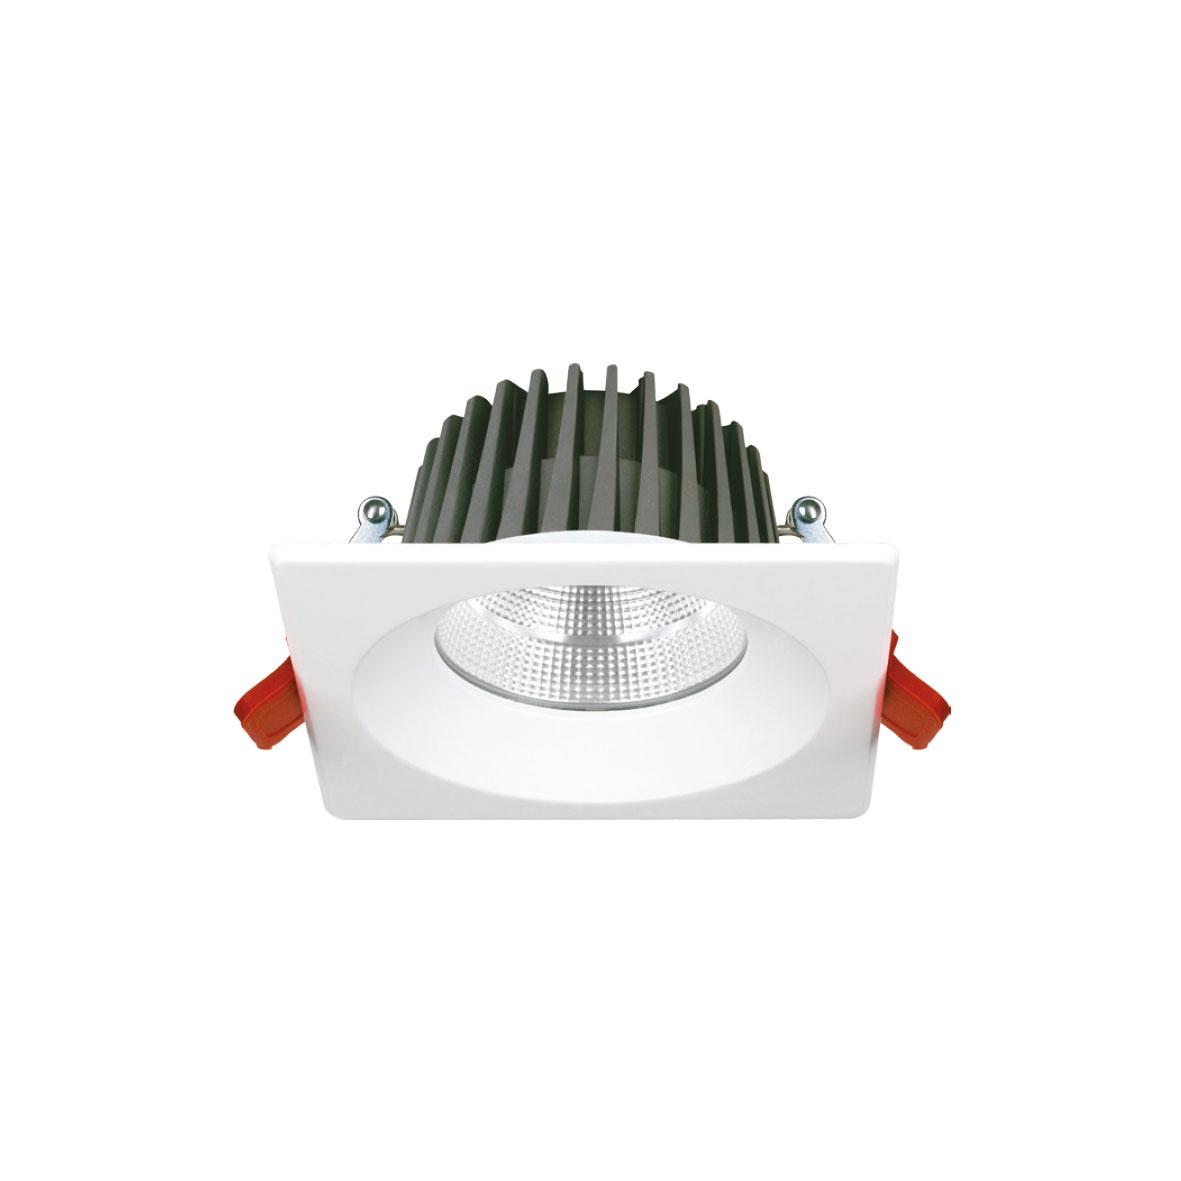 چراغ سقفی توکار SH-2513-7W